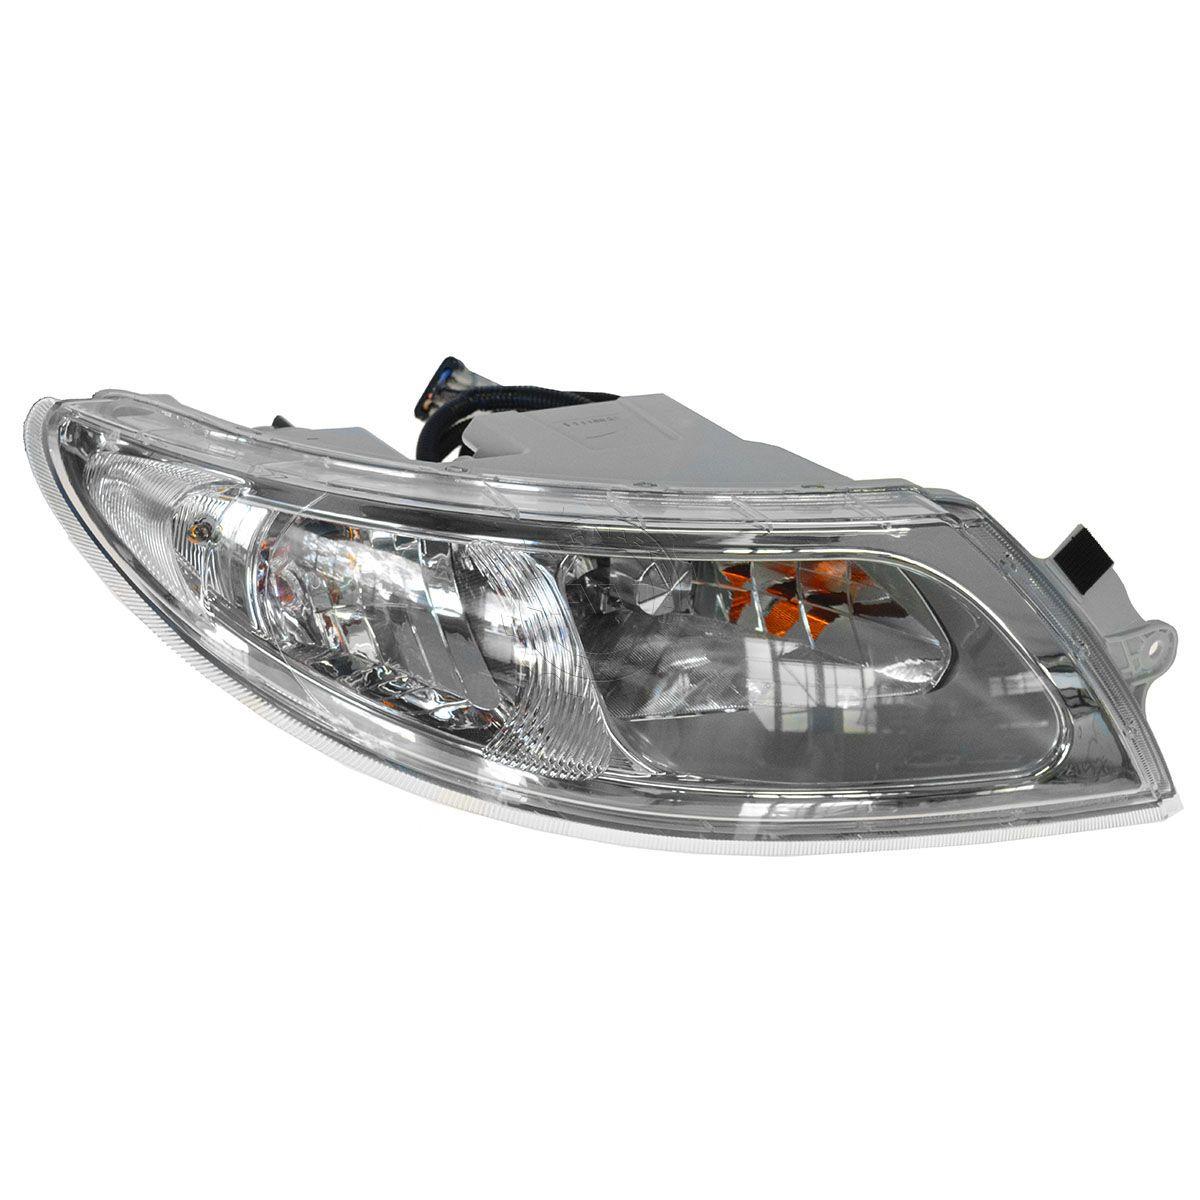 headlight headlamp right rh rf for international 4100 4200. Black Bedroom Furniture Sets. Home Design Ideas